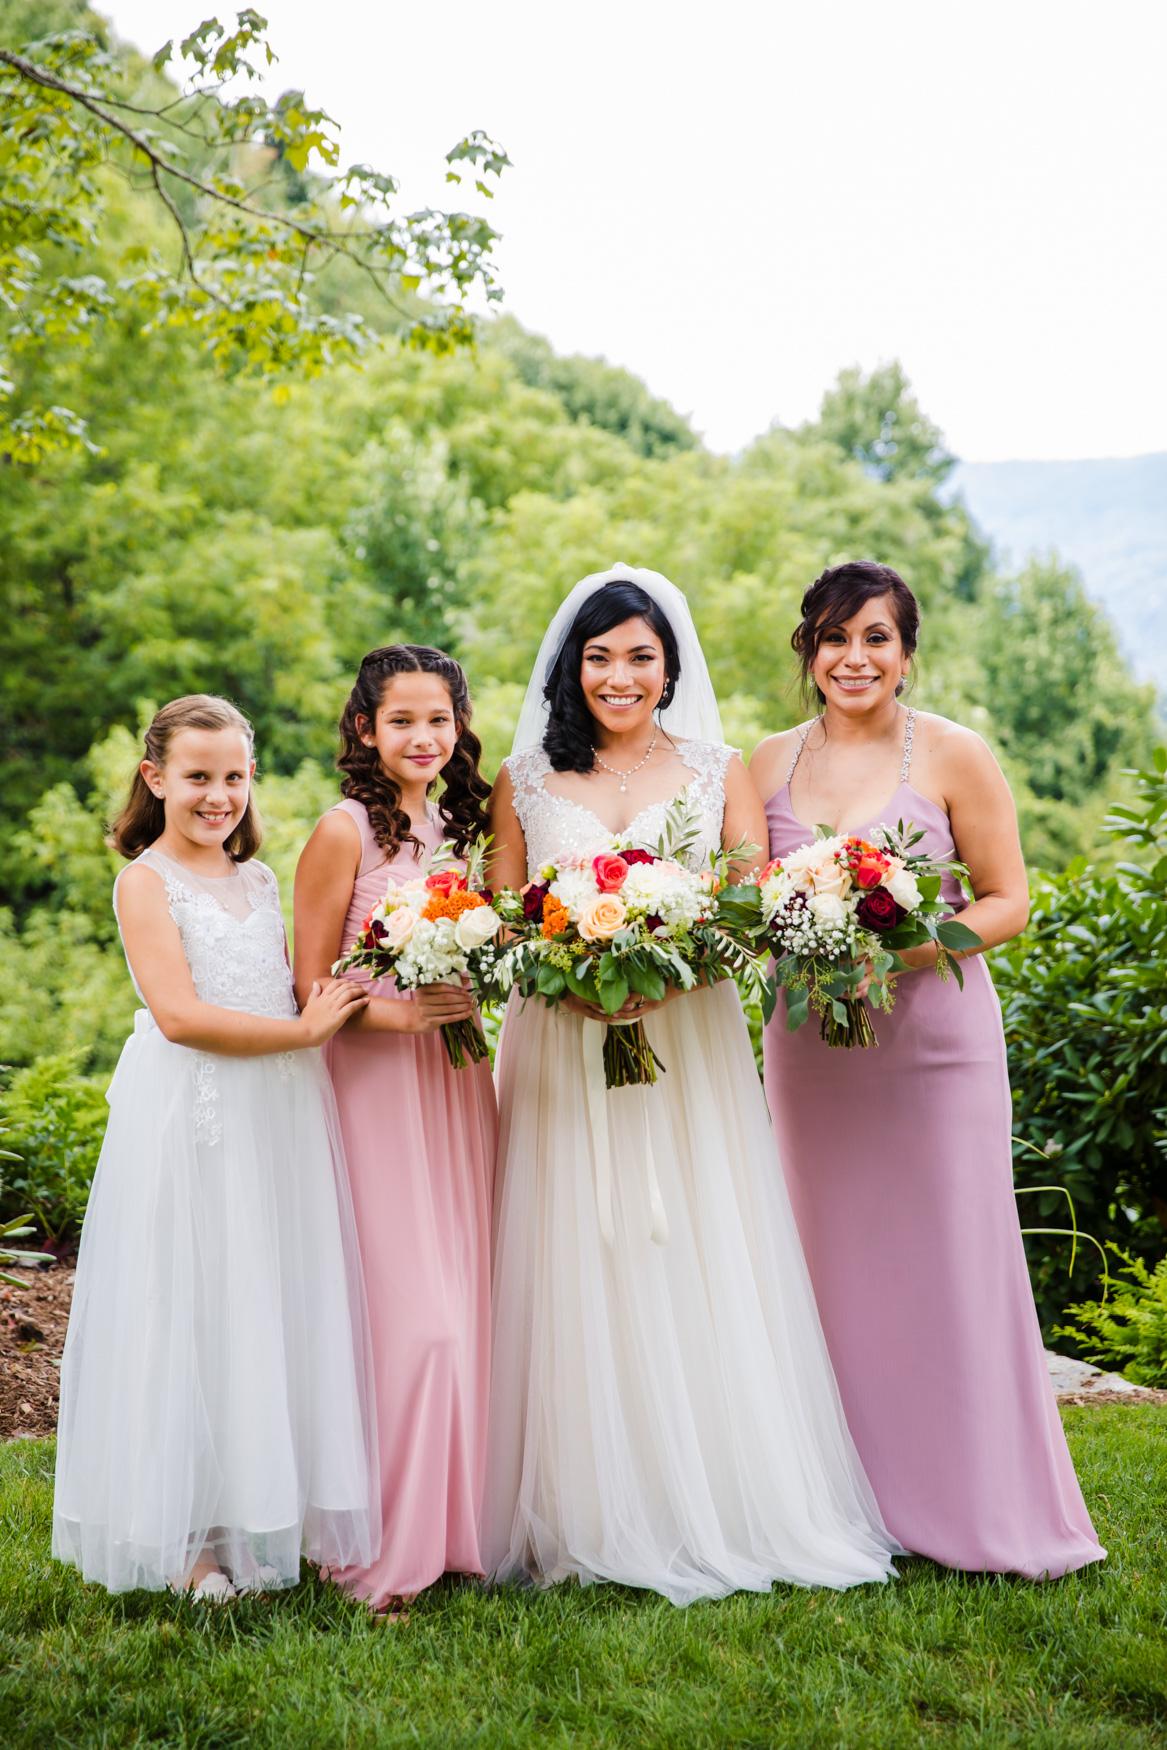 Bridesmaid Portrait Waynesville NC Wedding Photography Inn at Tranquility Farm